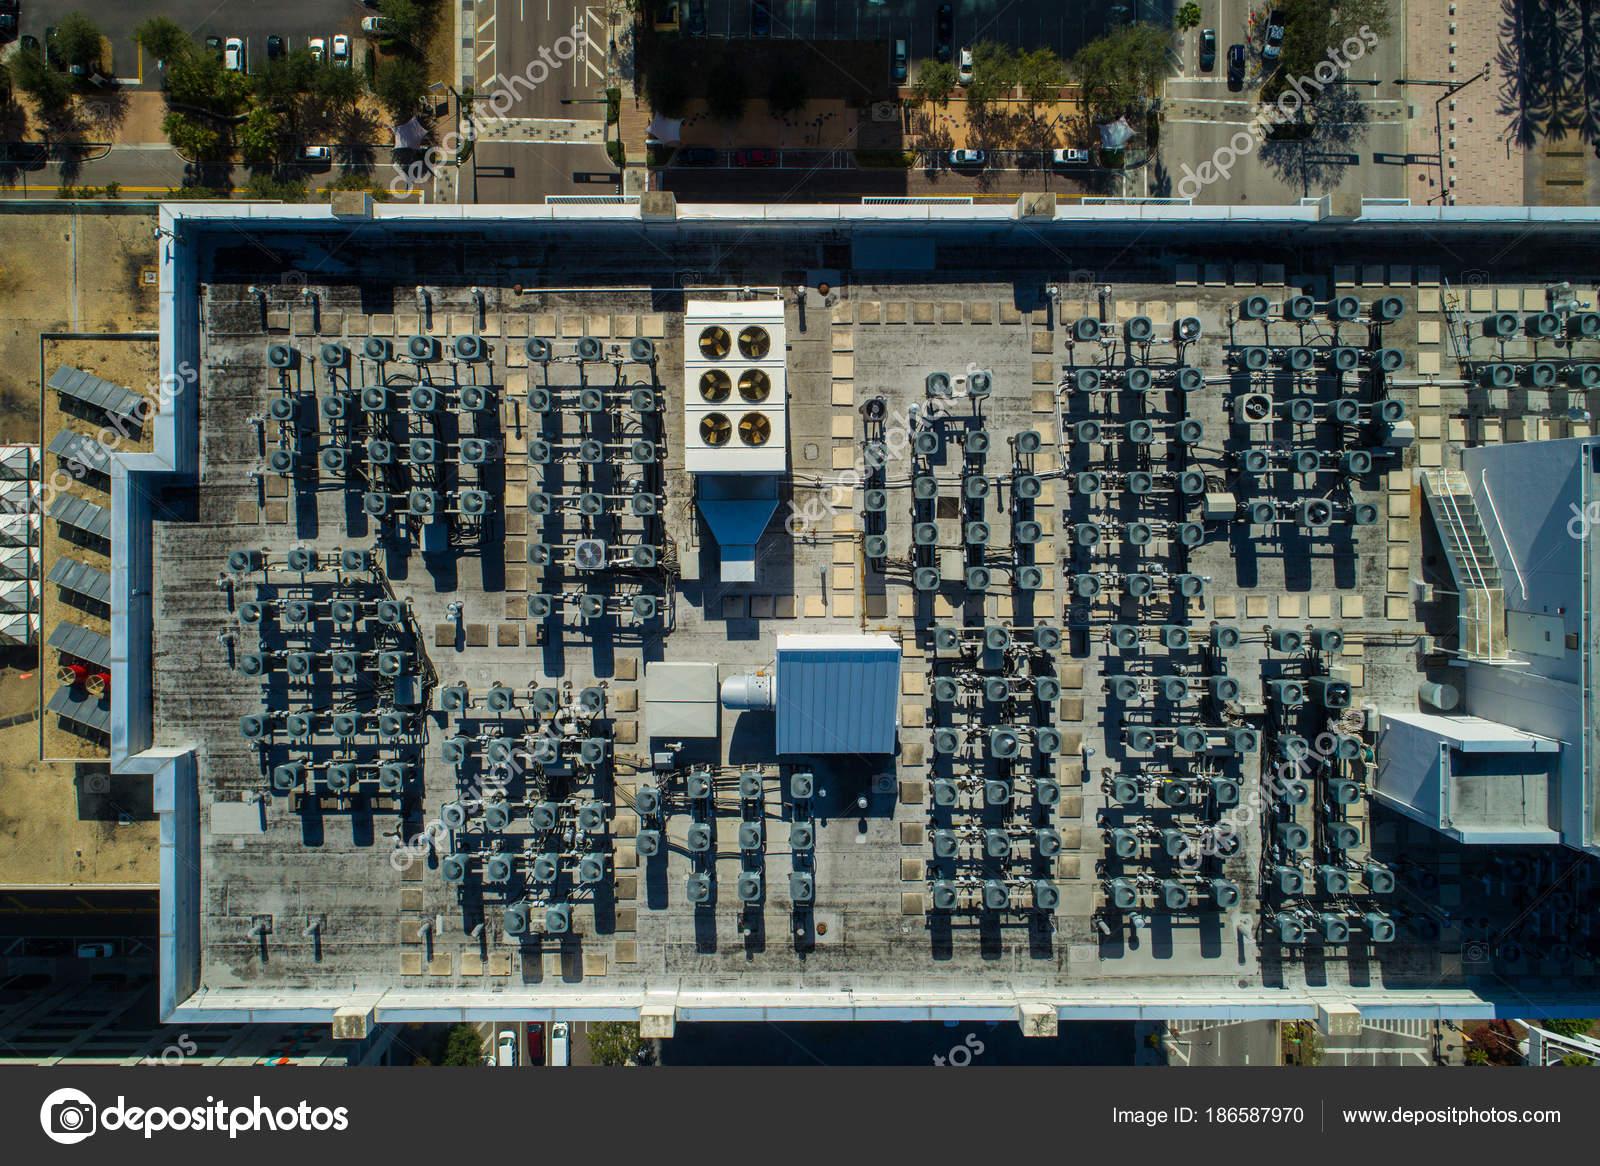 Aerial view rooftop hvac — Stock Photo © felixtm #186587970